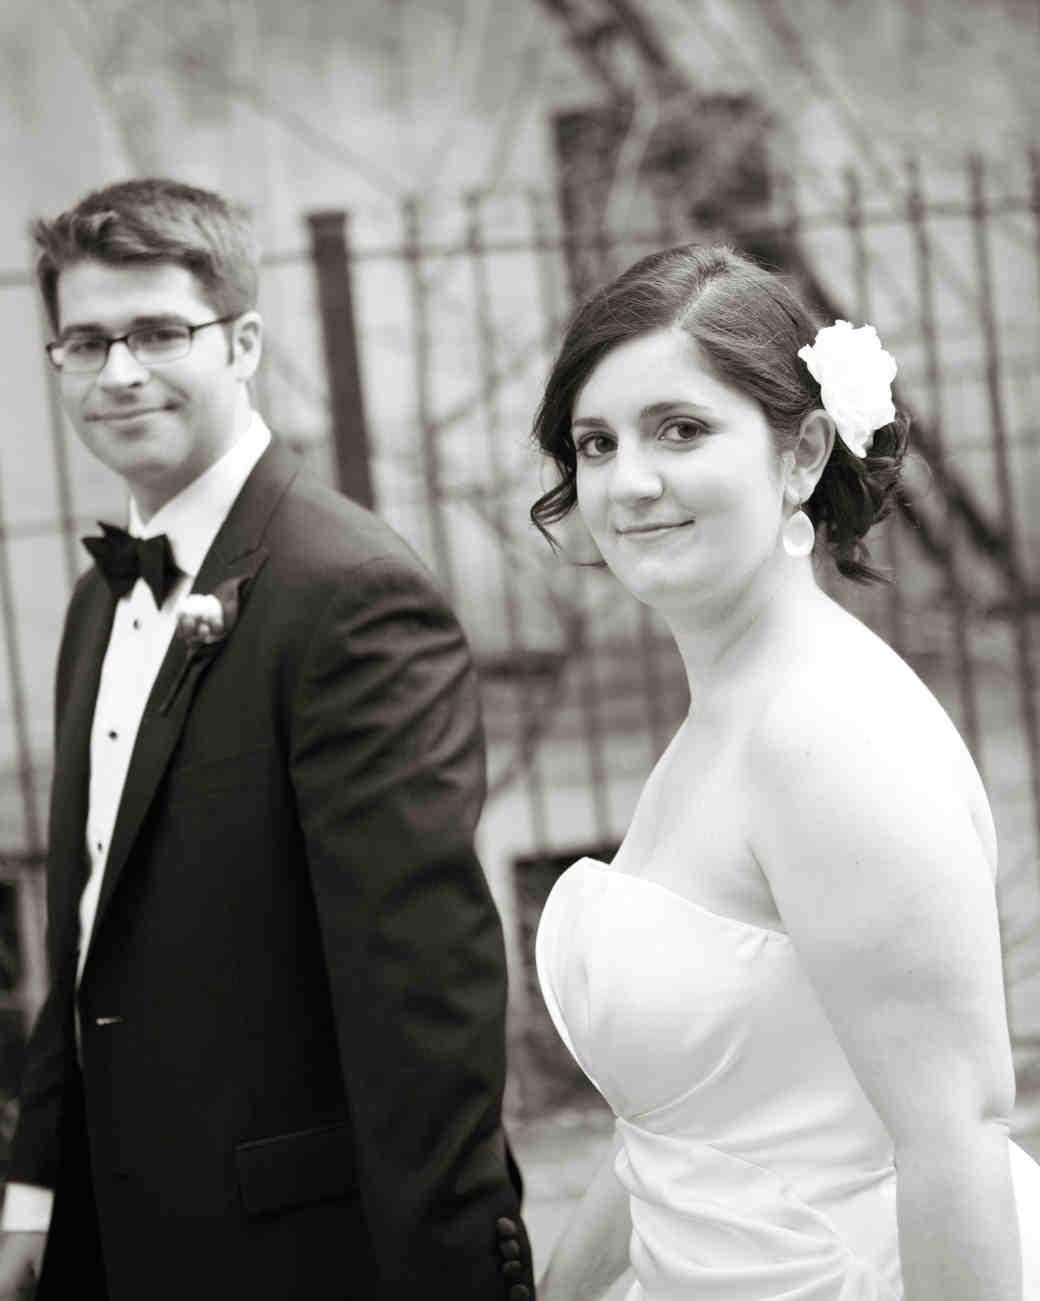 relationship-resolution-brooklyn-bride-vane-broussard-1214.jpg